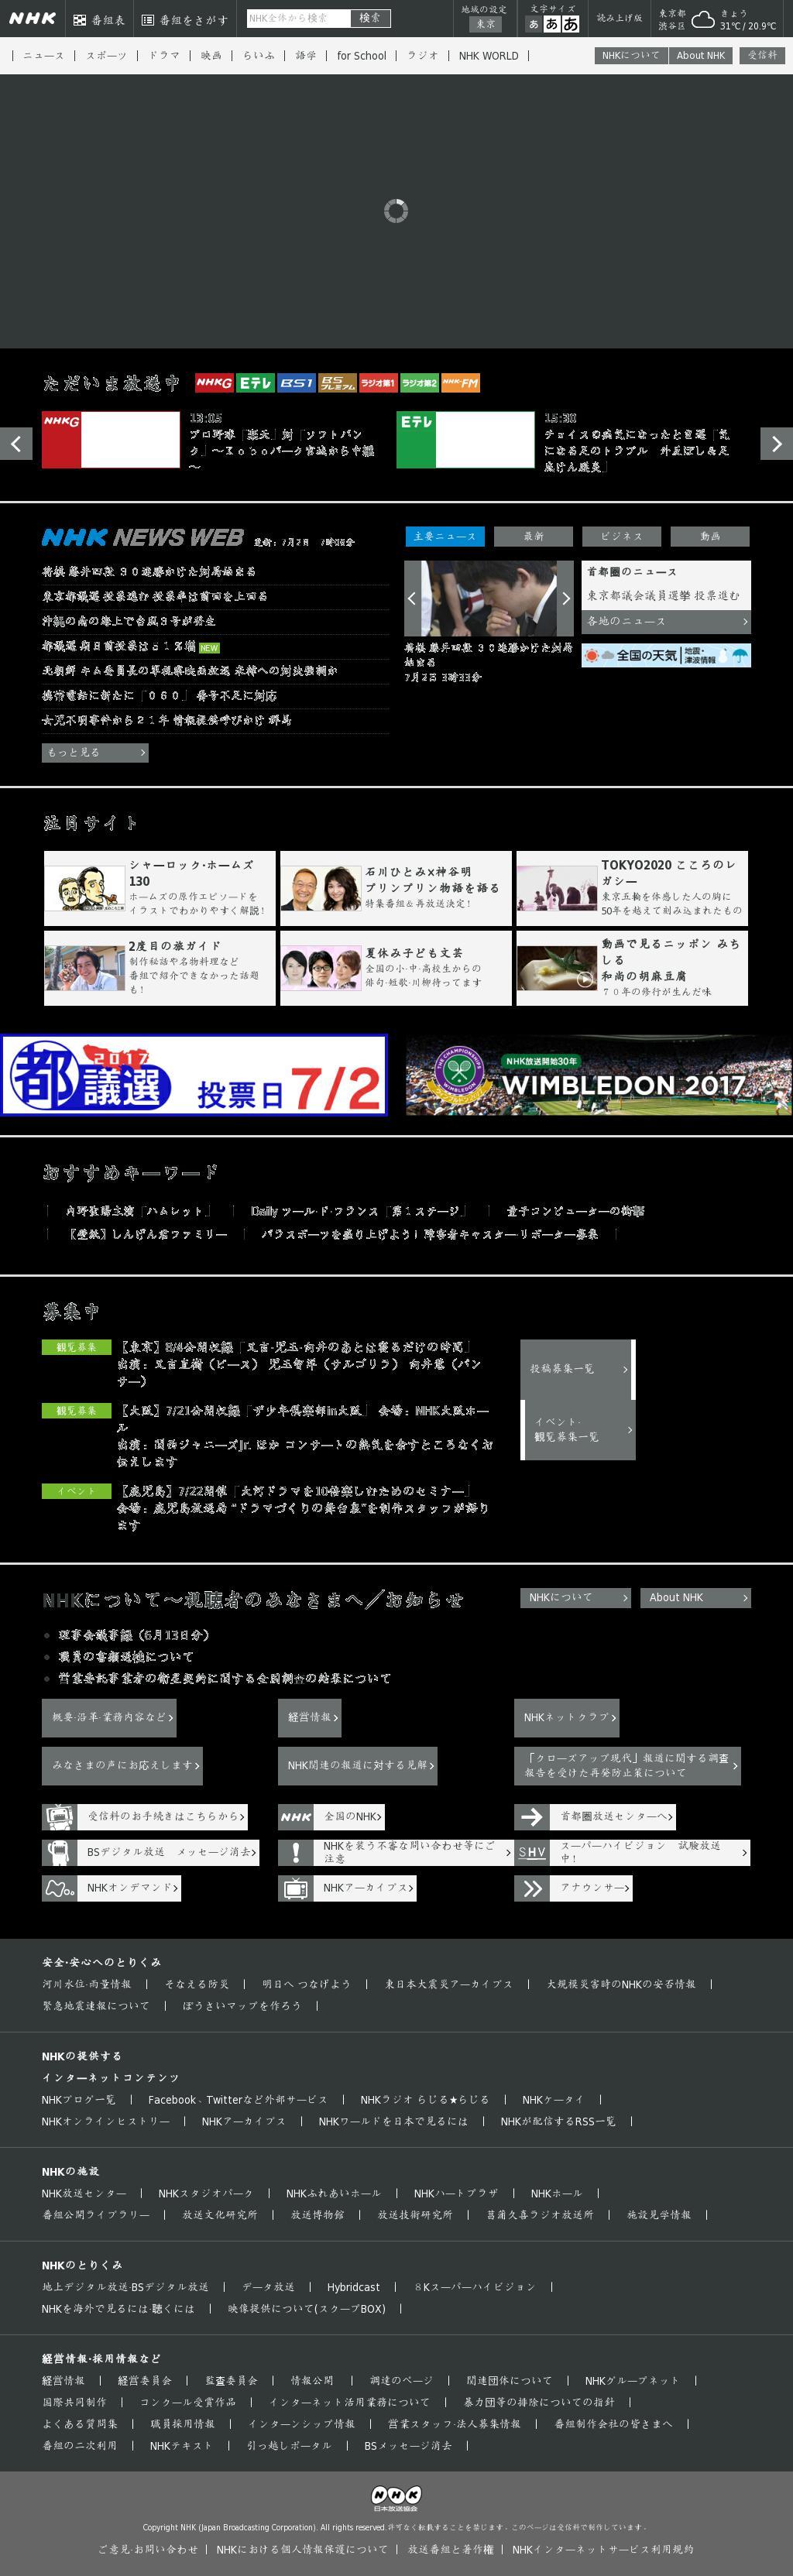 NHK Online at Sunday July 2, 2017, 7:13 a.m. UTC